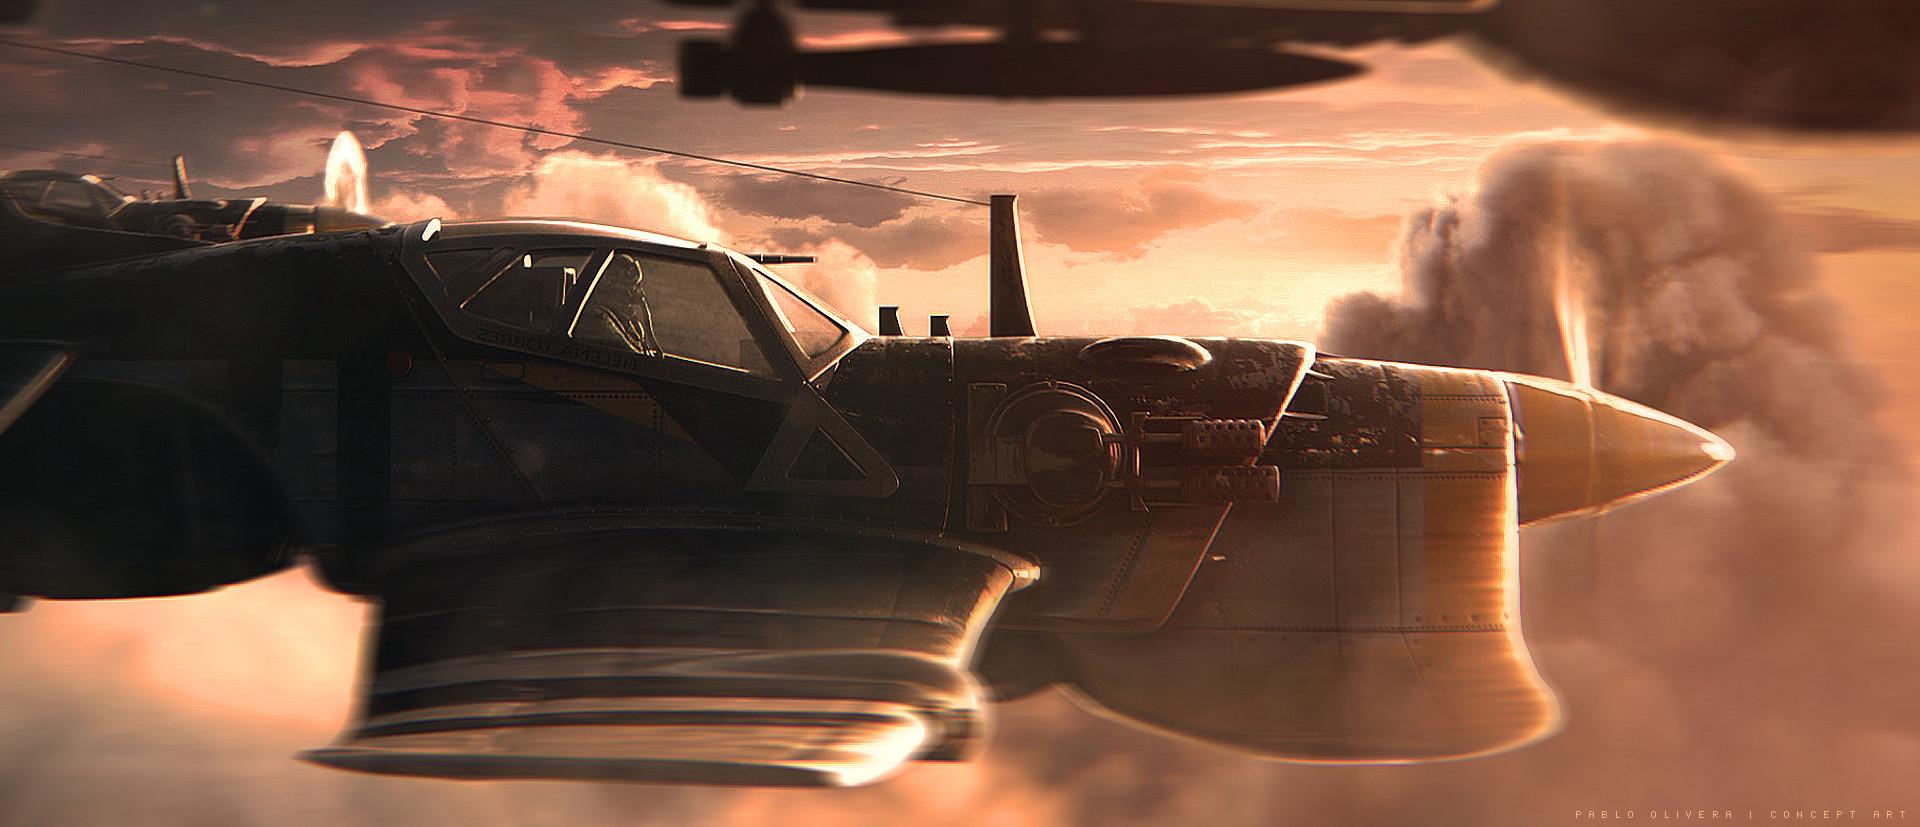 Pablo olivera helena pilot airplane concept art 04